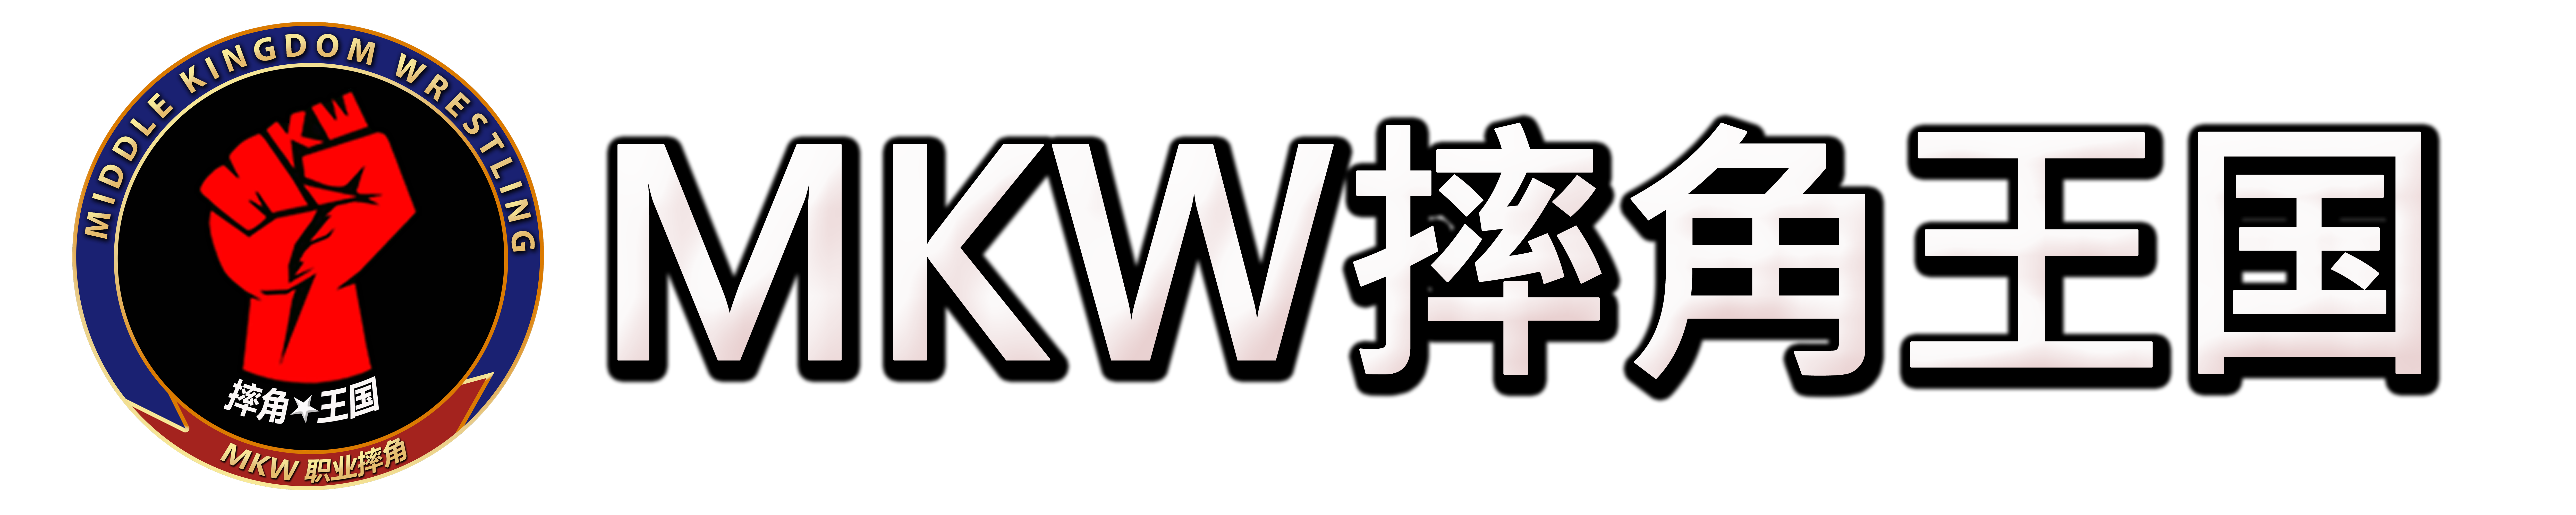 MKW 摔角王国